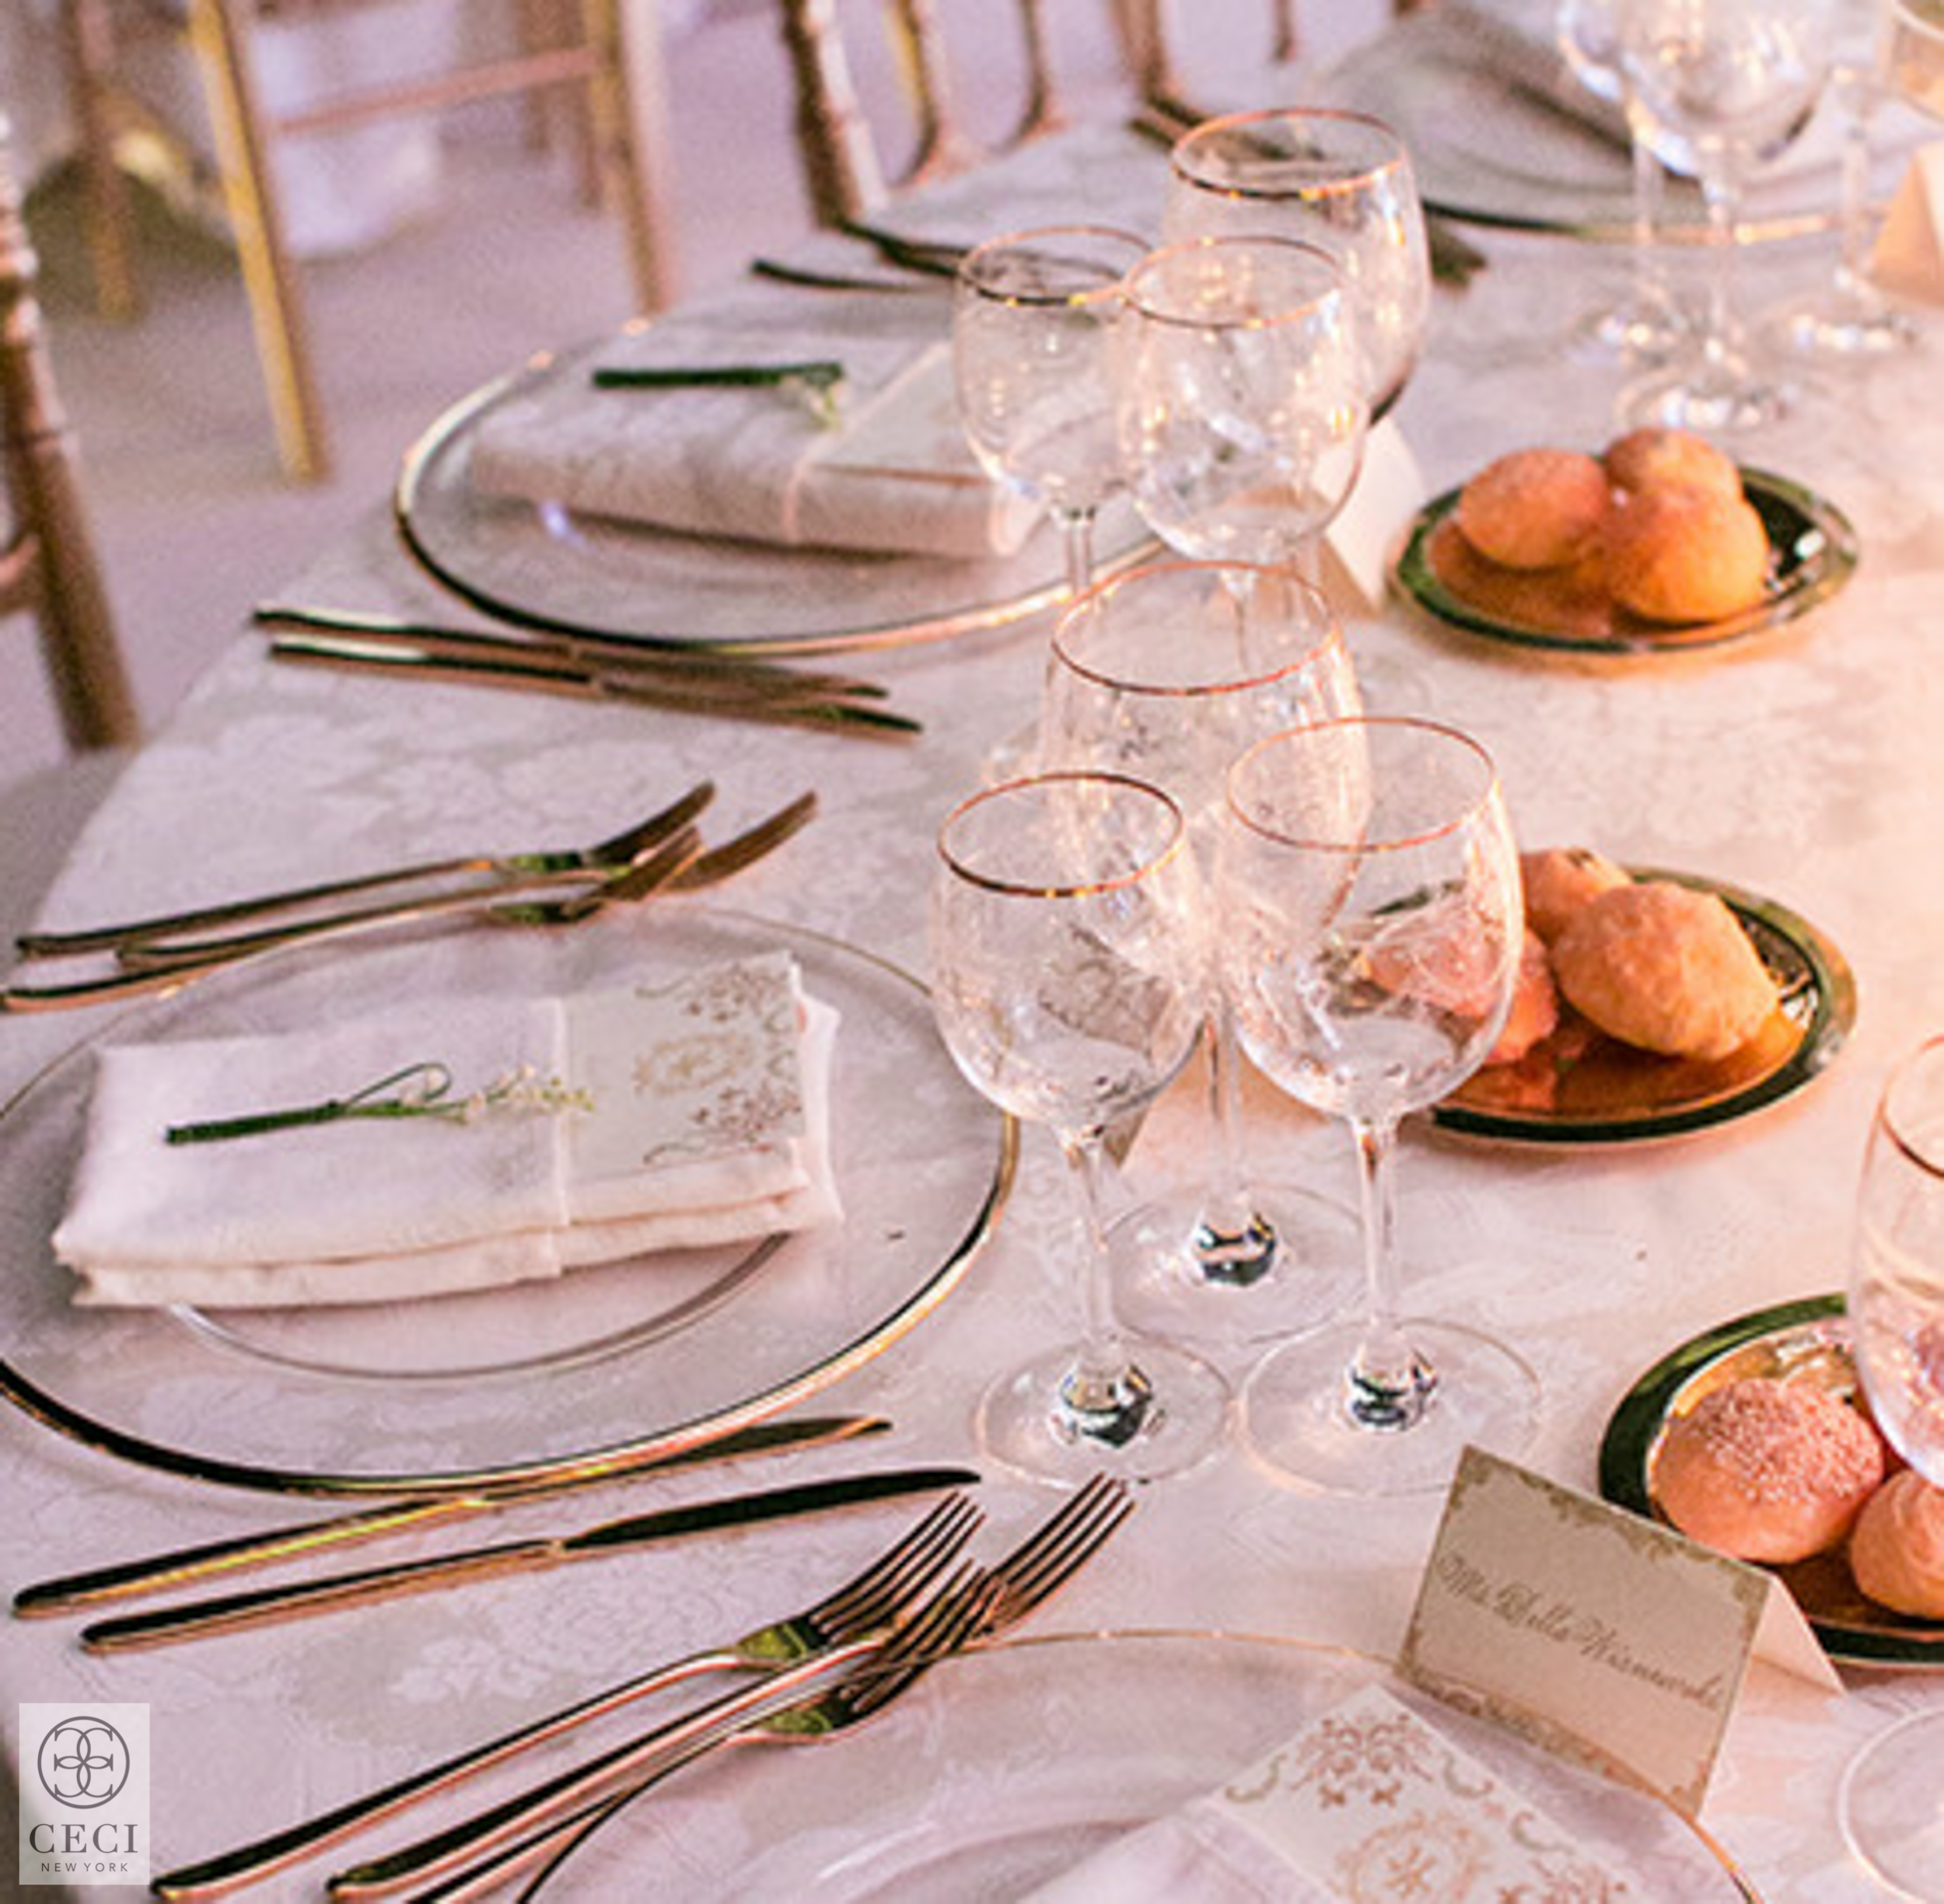 Ceci_New_York_Wedding_Lake_Como_Italy_Luxury_Style_Custom_Invitation-12.jpg